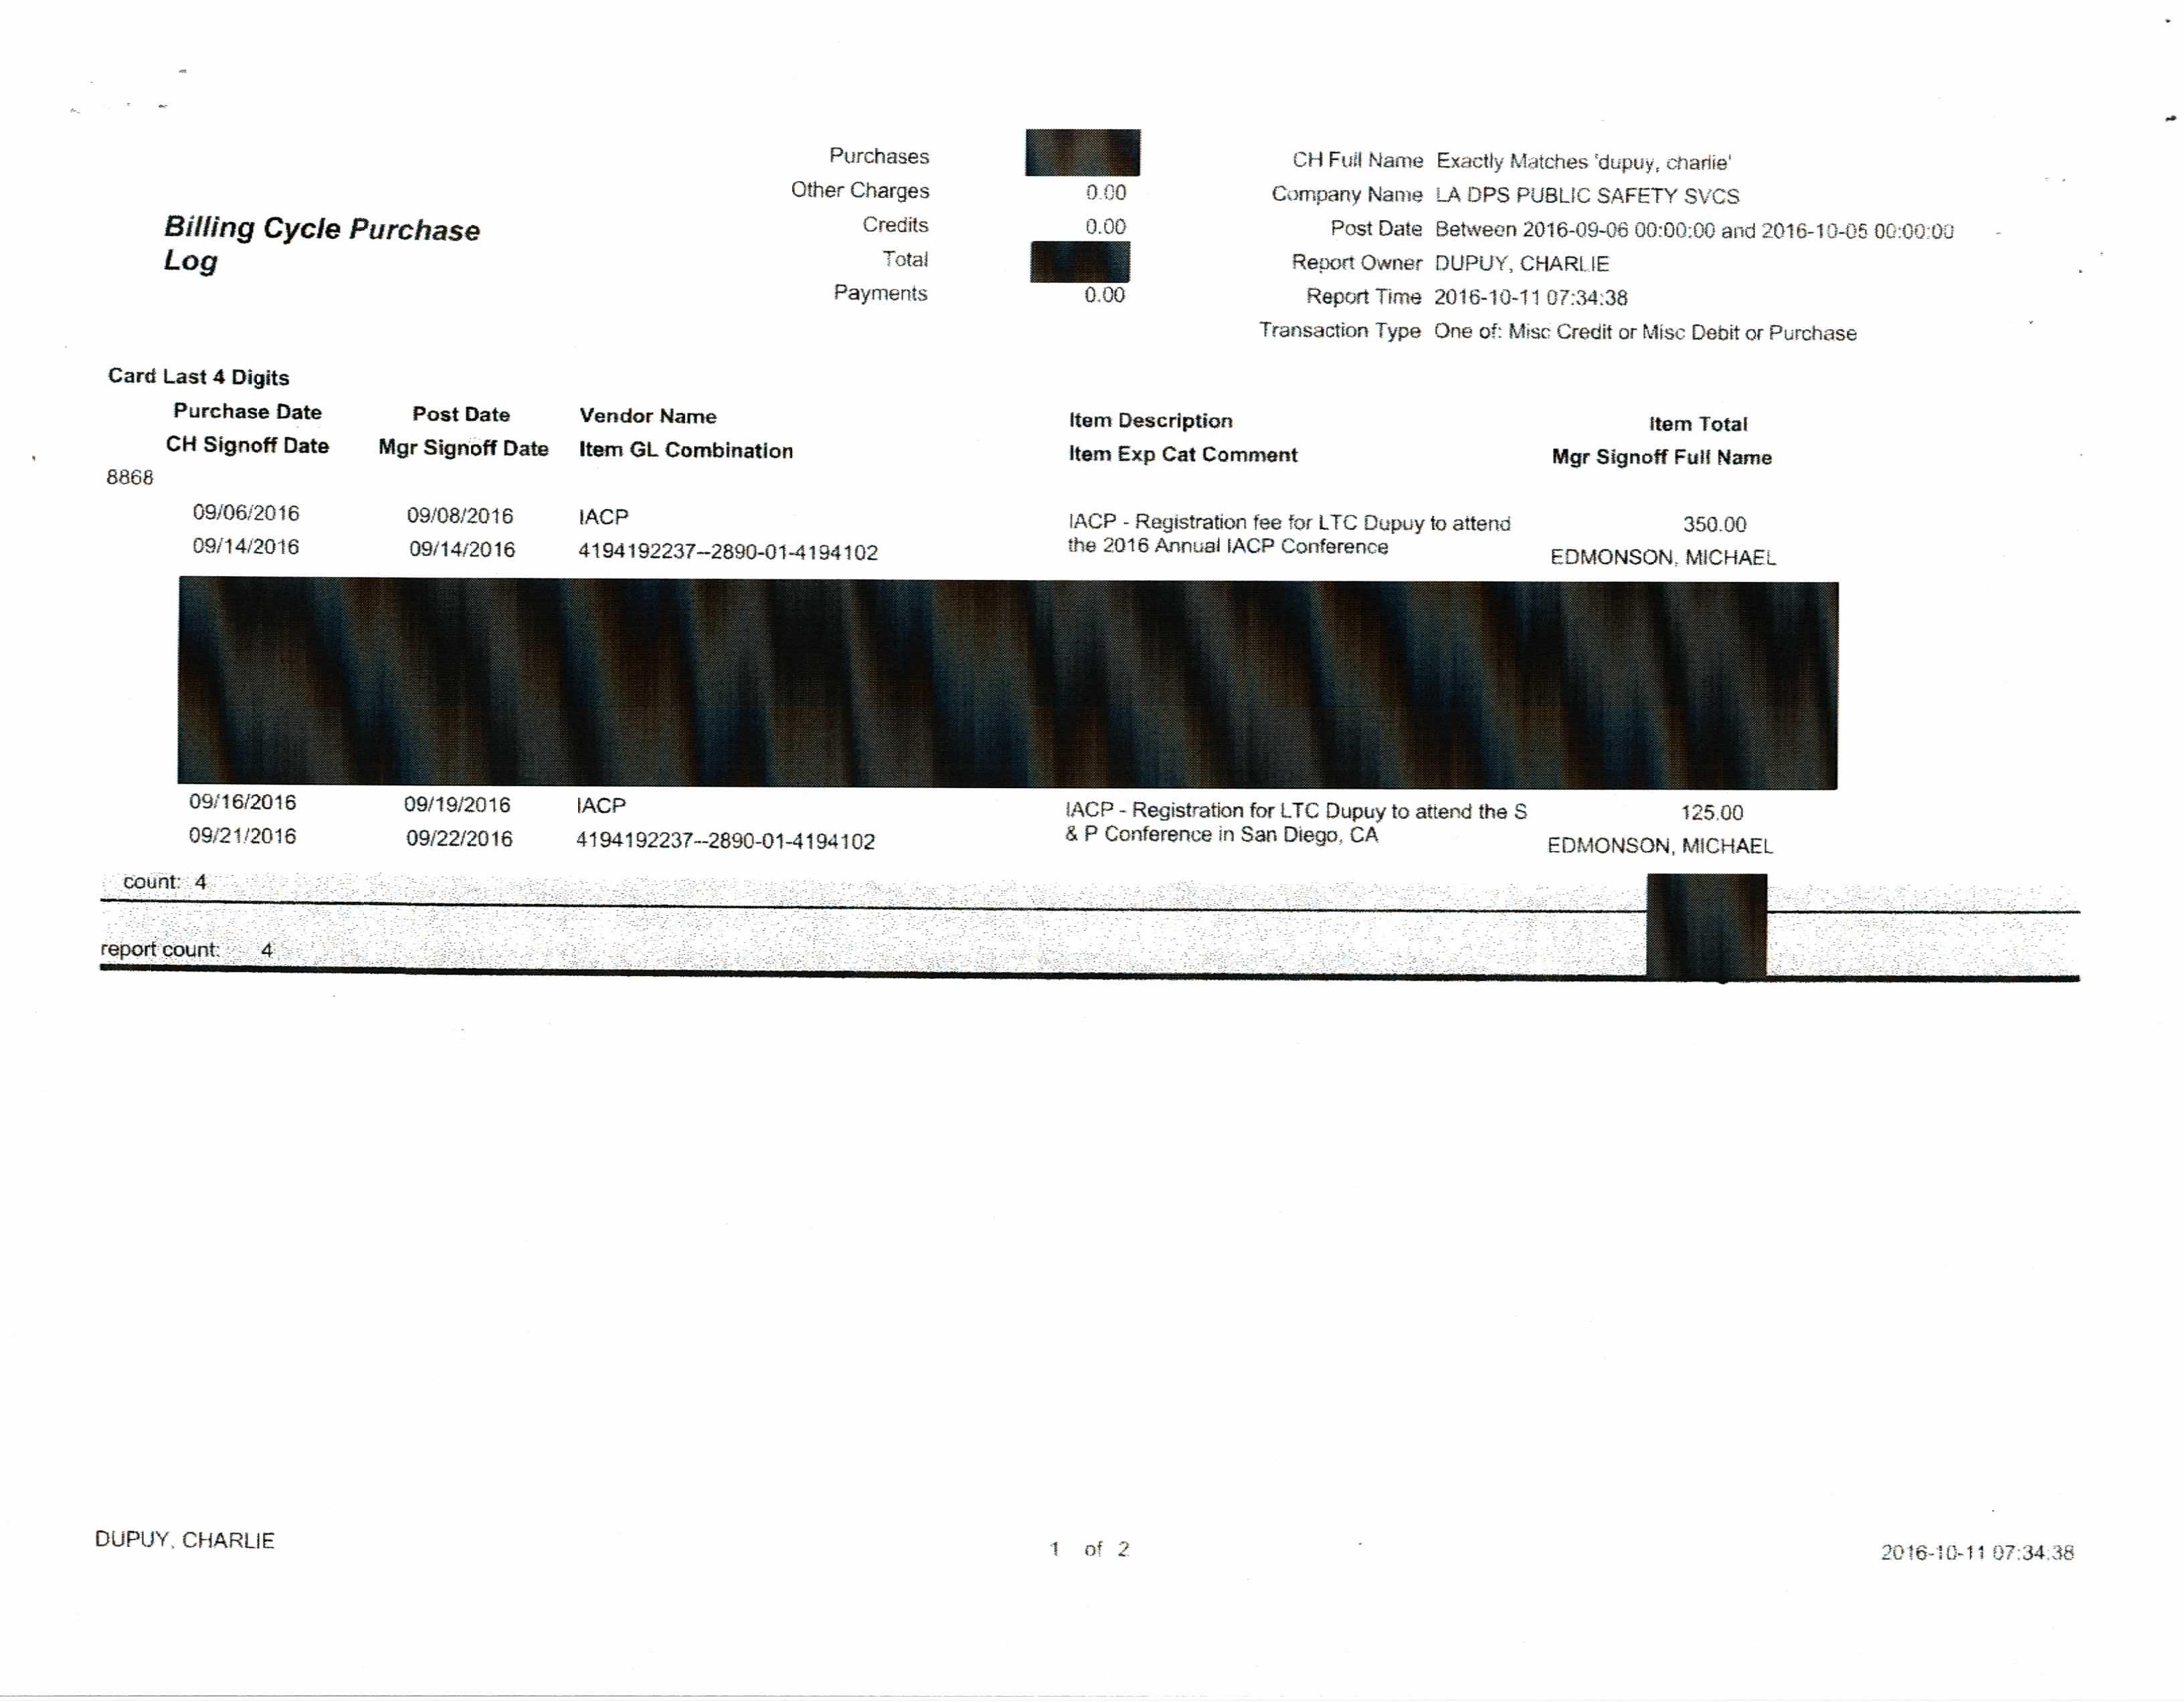 Get A Receipt Pdf Revenue  Louisiana Voice Uscis Immigrant Fee Receipt with How To Type Up An Invoice Excel Redactededmonsoninvoice Invoice For Ebay Pdf